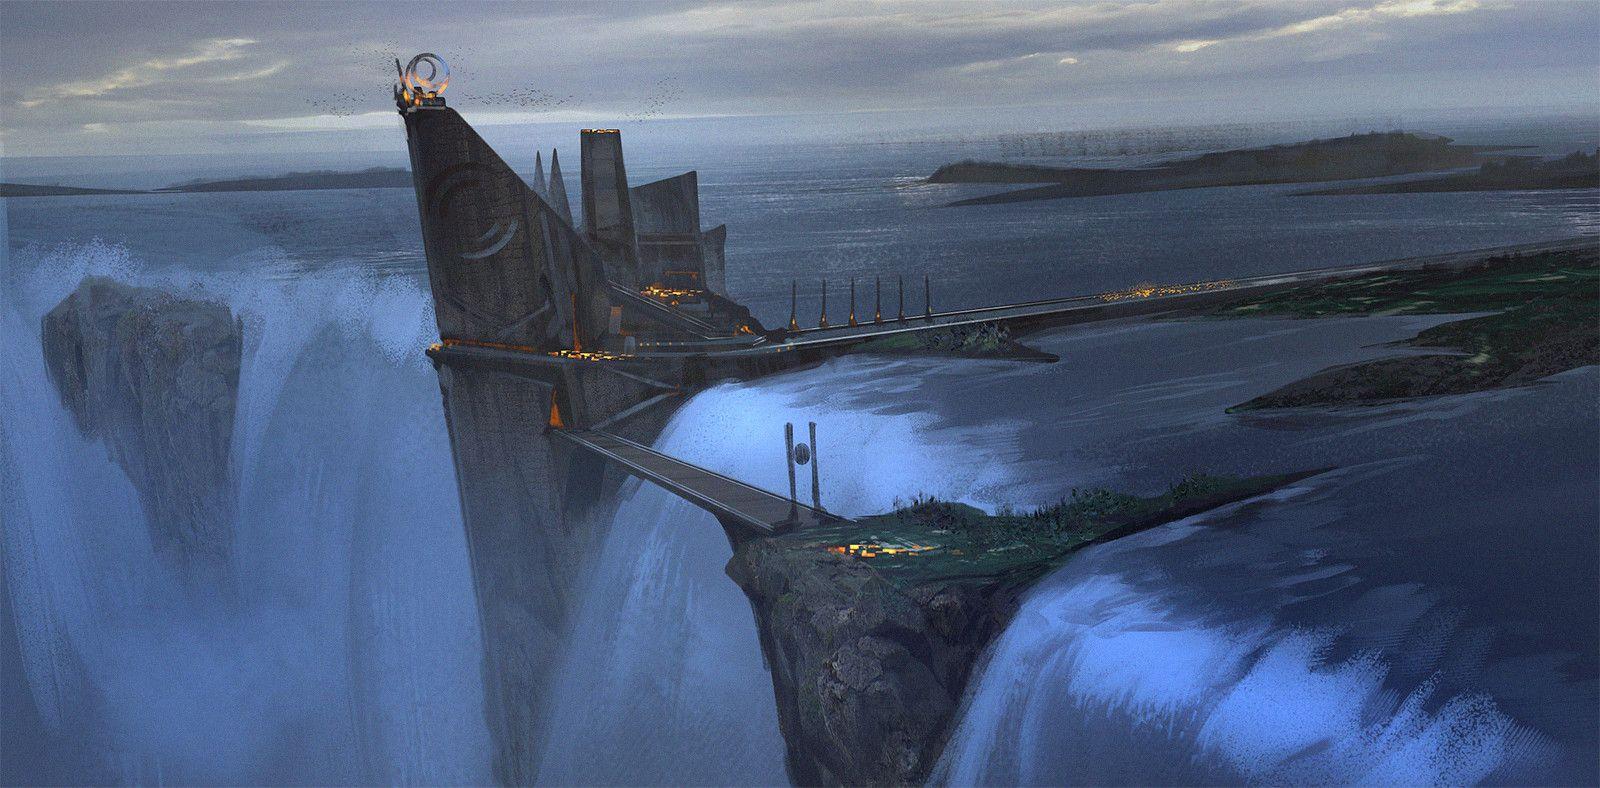 ArtStation - Waterfall - Sketch, Ned Rogers